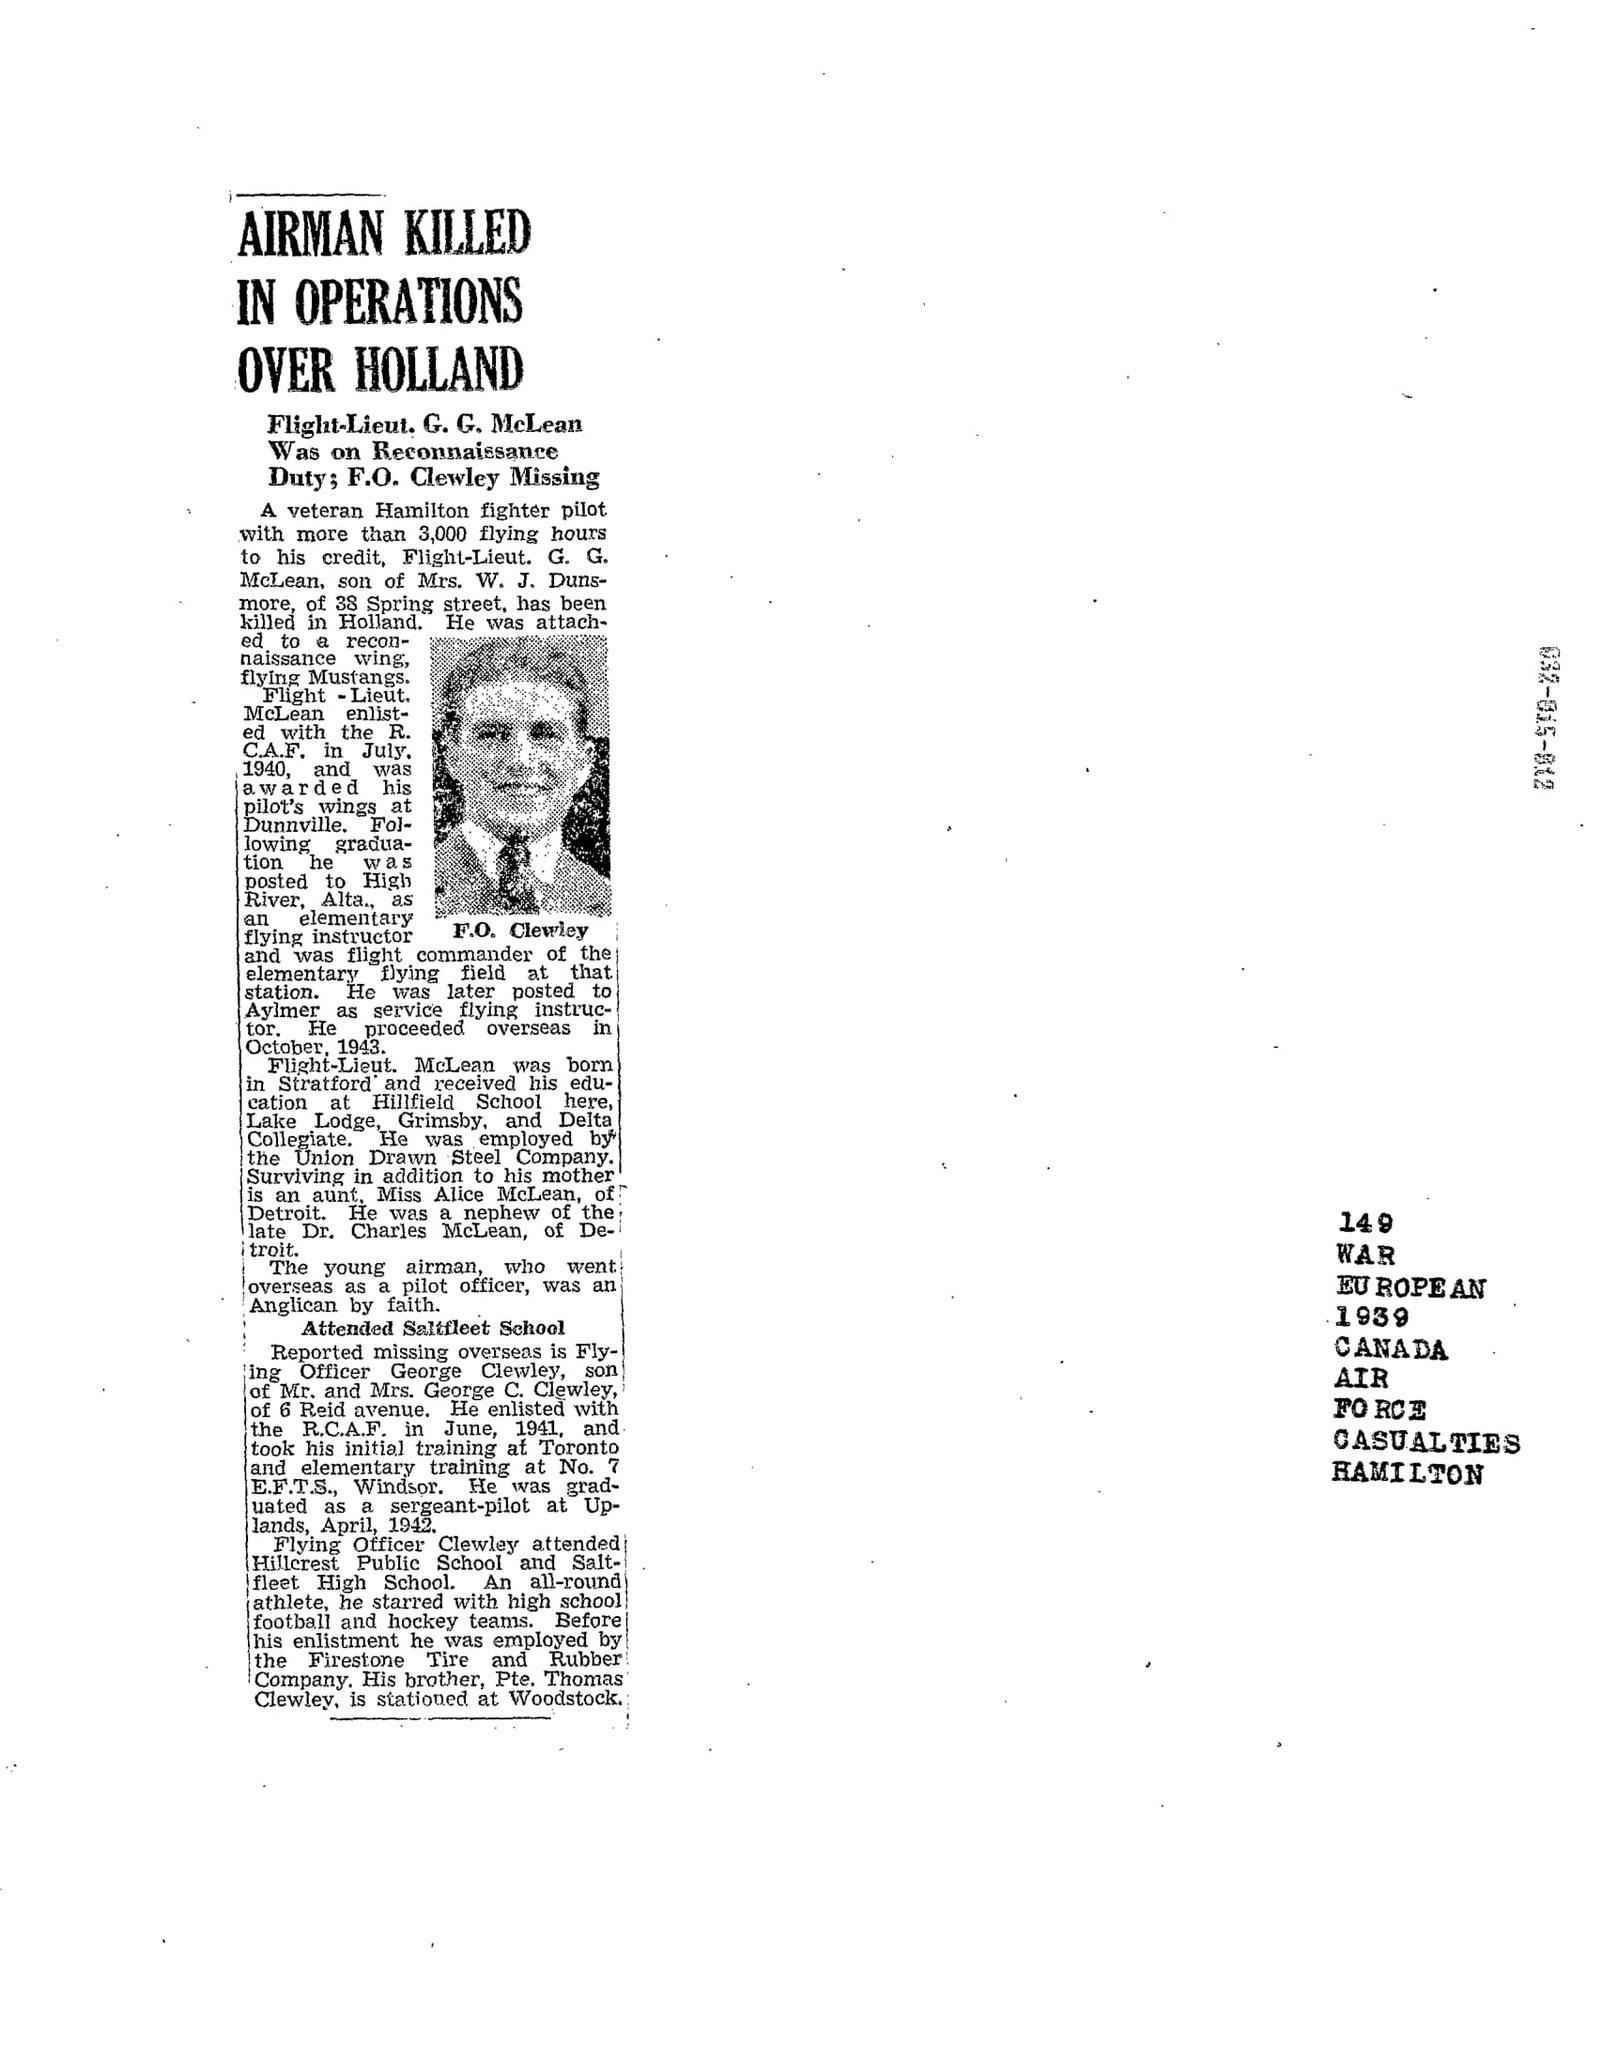 Hamilton Spectator 11-12-1944